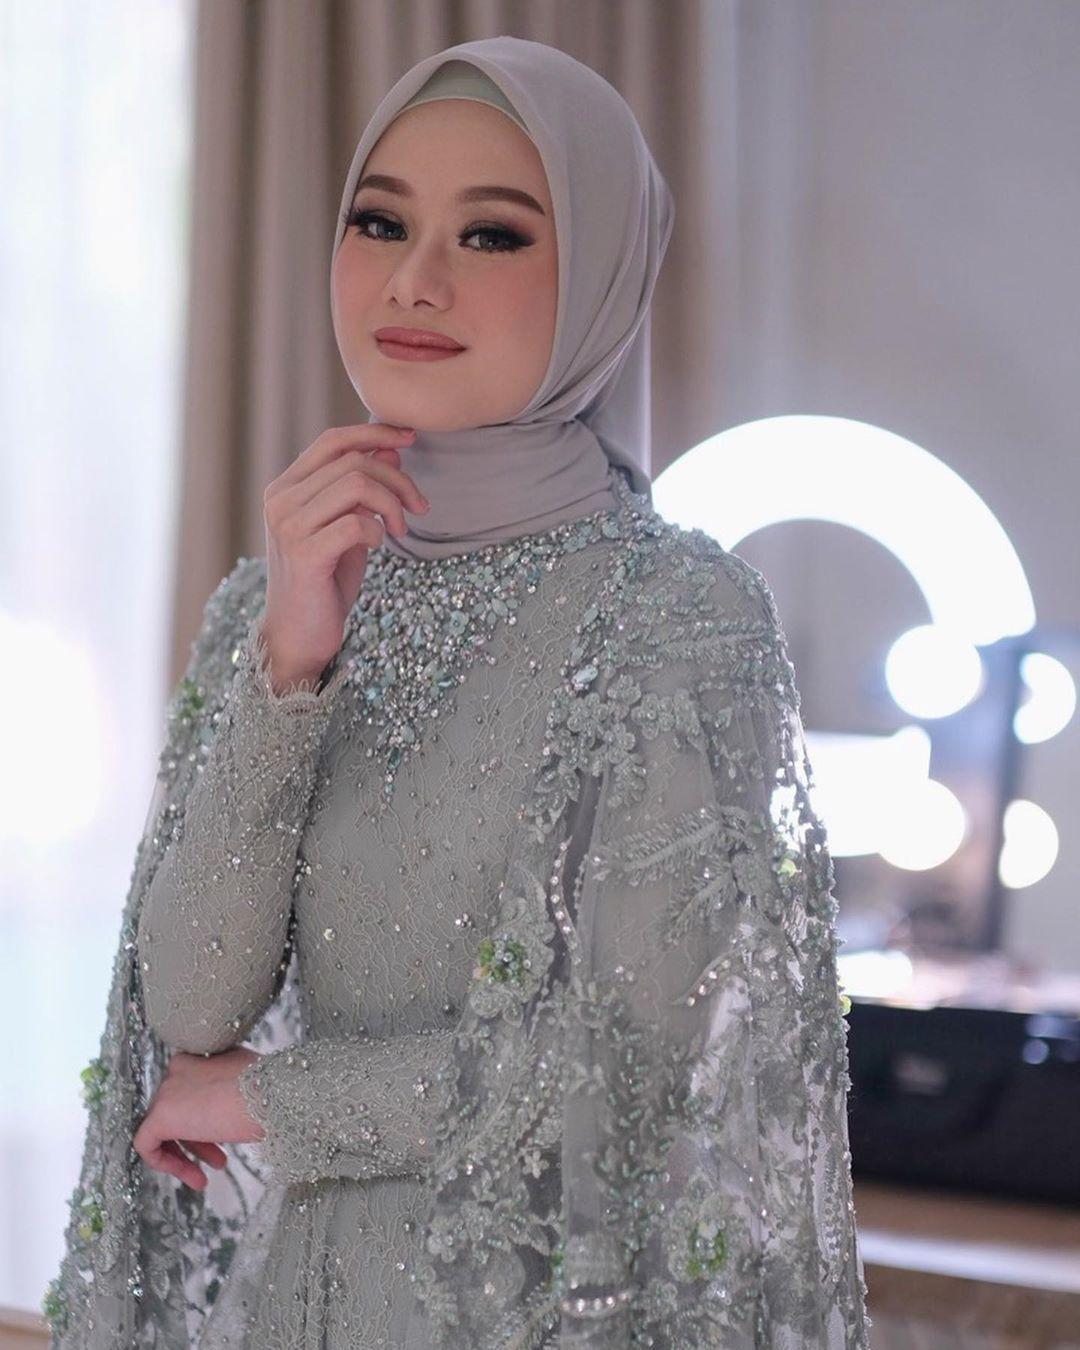 Tampilan Lamaran Dinda Hauw Dihari Lamarannya Pengantin Wanita Wanita Gaya Pengantin